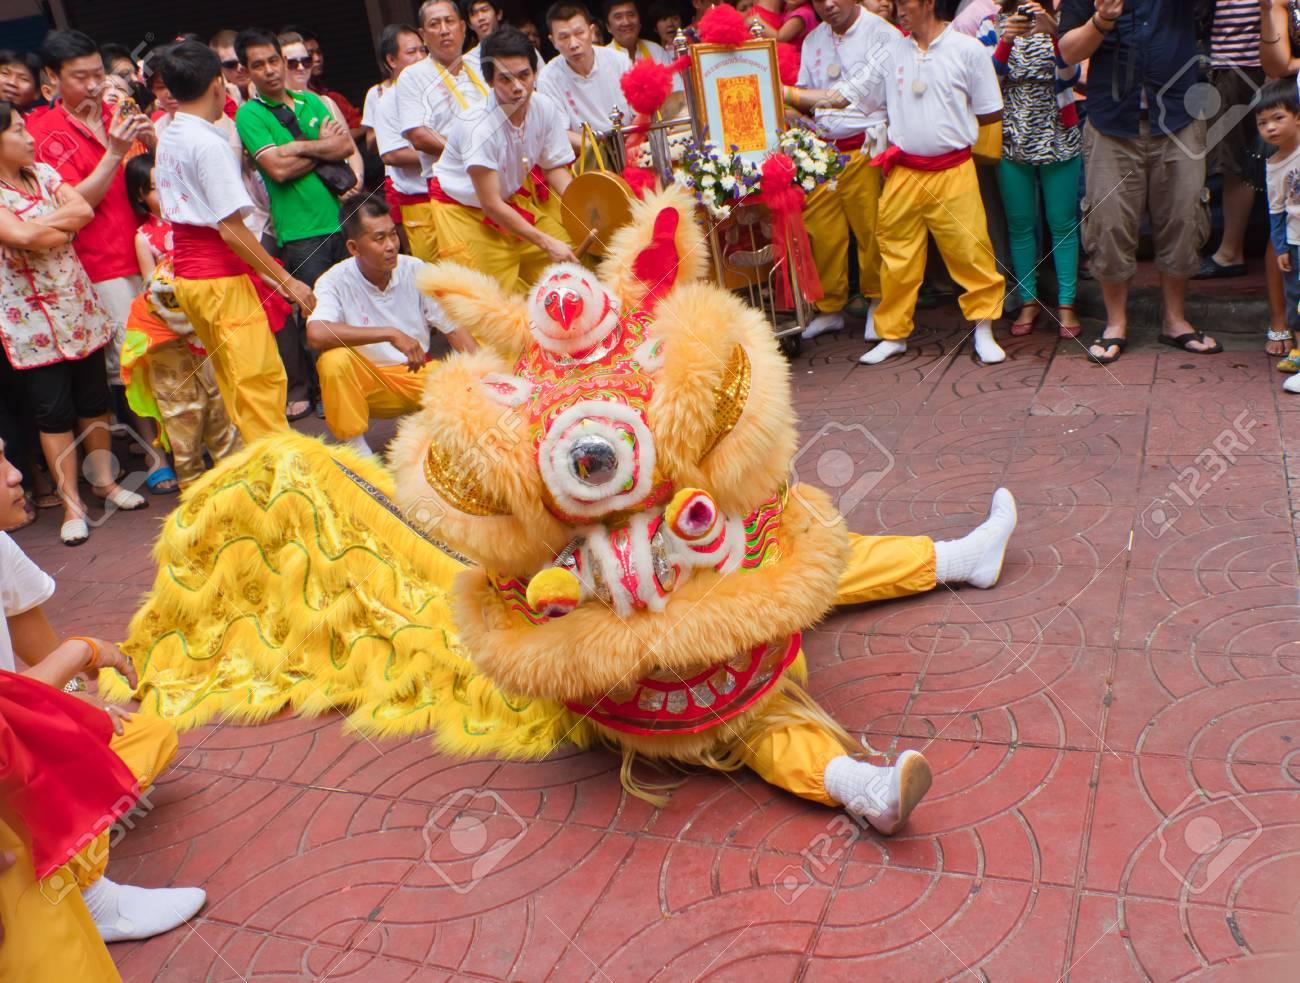 bangkokchinatownthailand february 10chinese new year traditions chinese new year